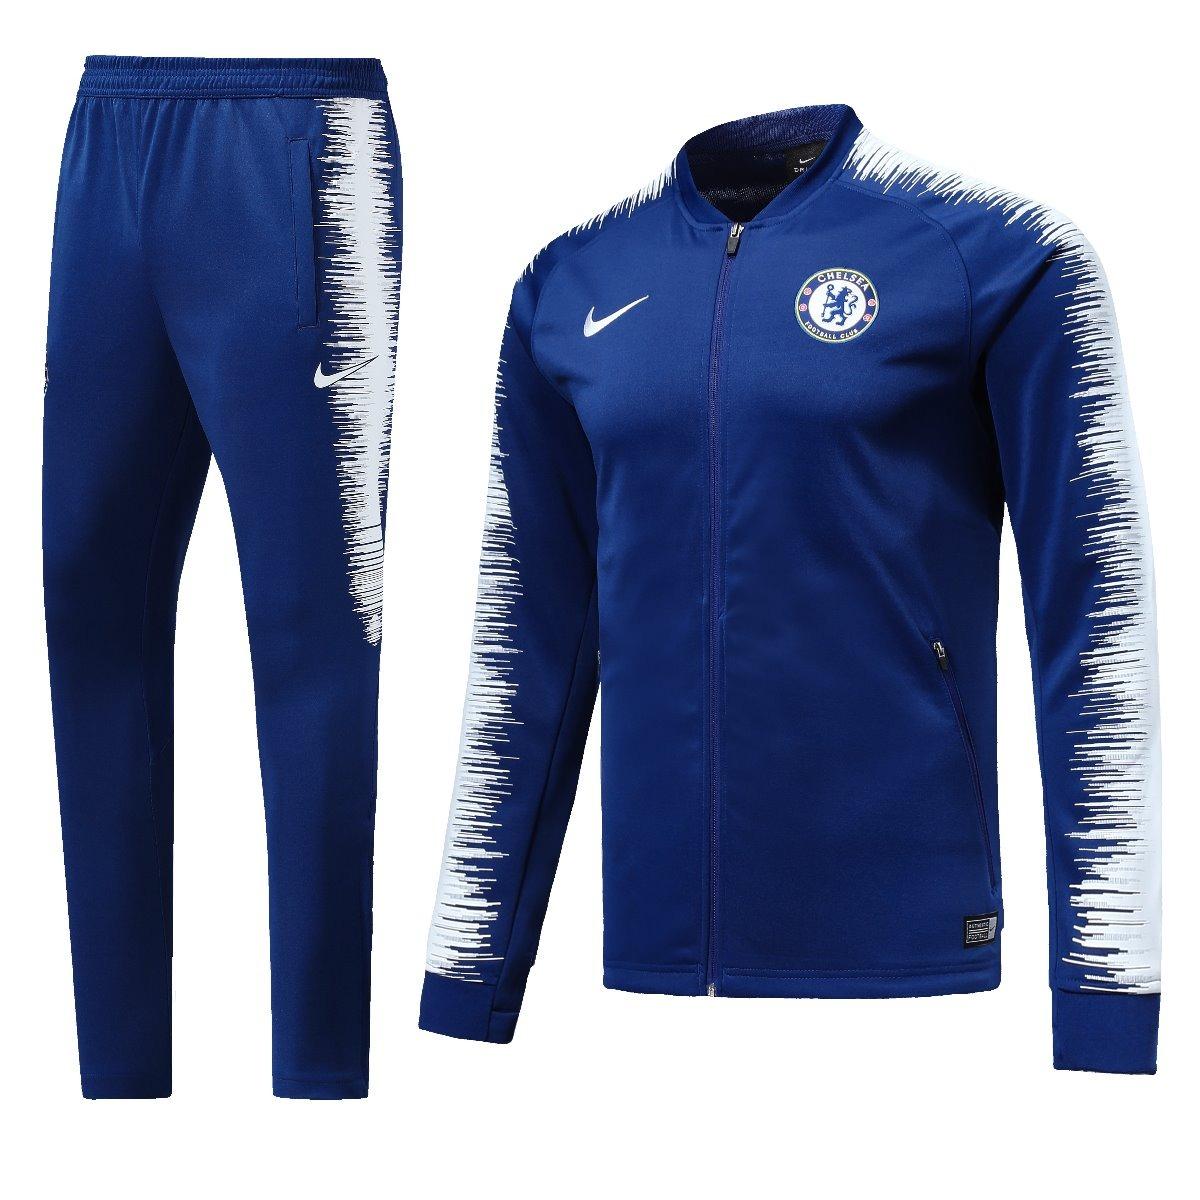 bf89580579 novo agasalho jaqueta conjunto treino chelsea 2018 2019. Carregando zoom.